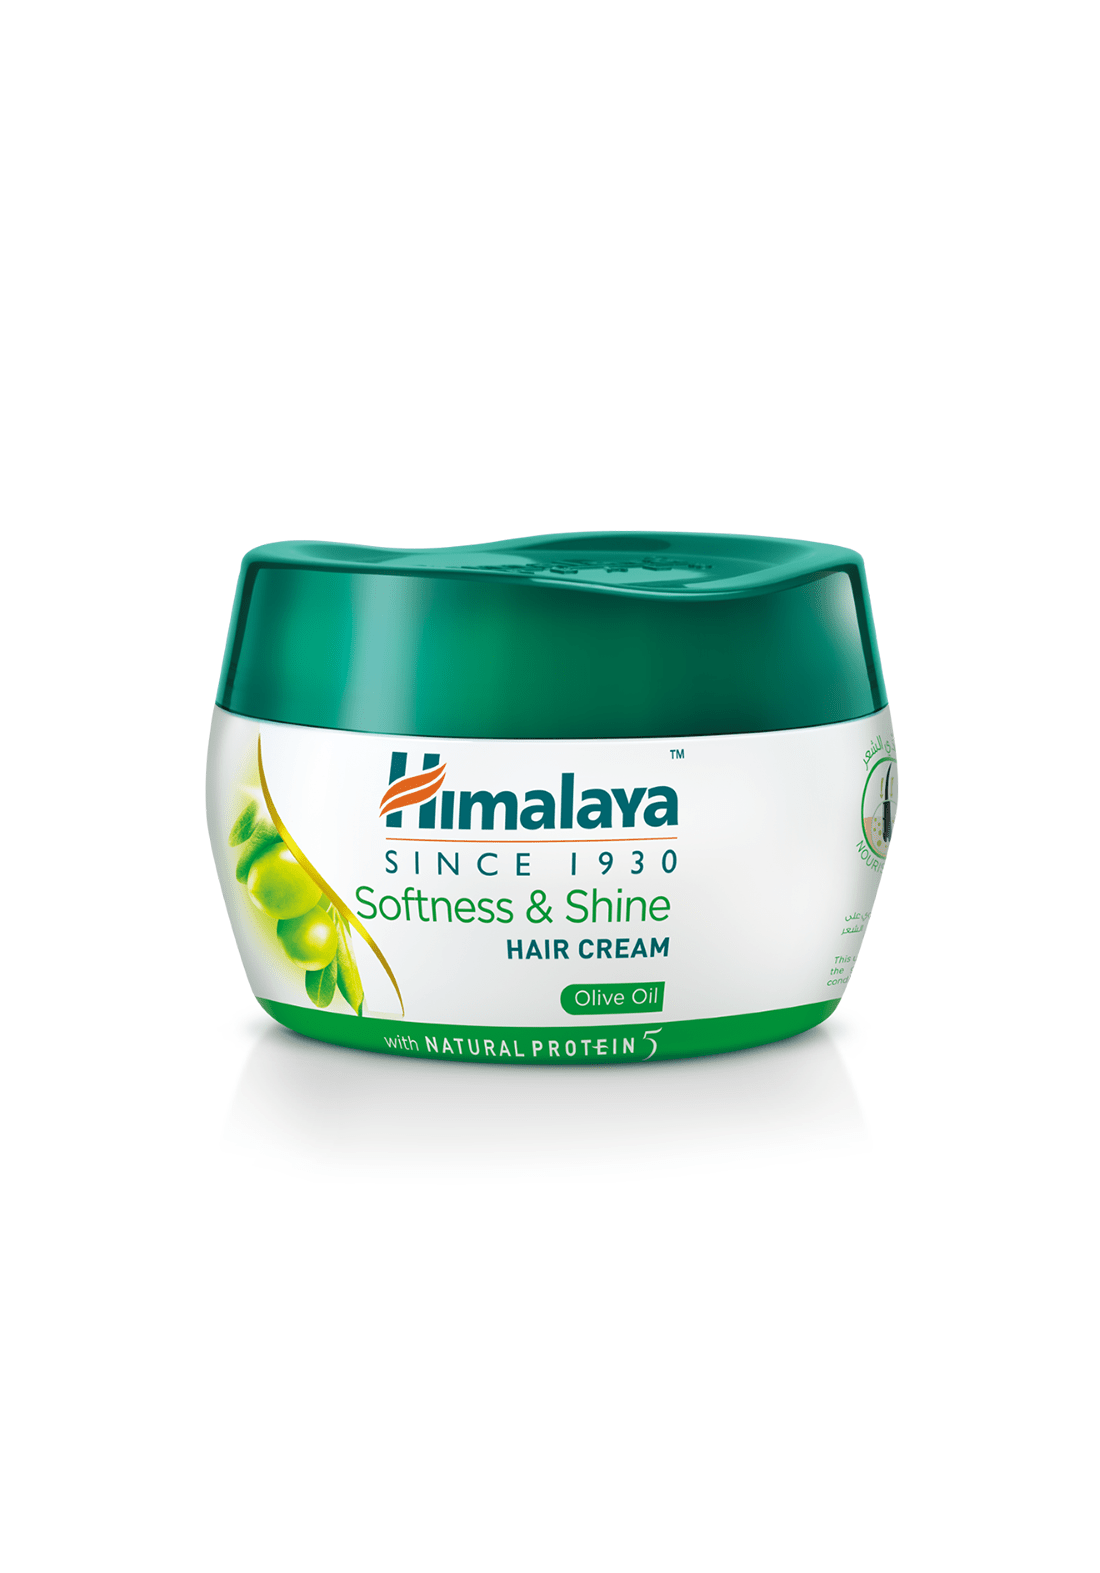 Hair Cream - Softness & Shine Hair Cream هيمالايا كريم الشعر لنعومة و لمعان 140 مل